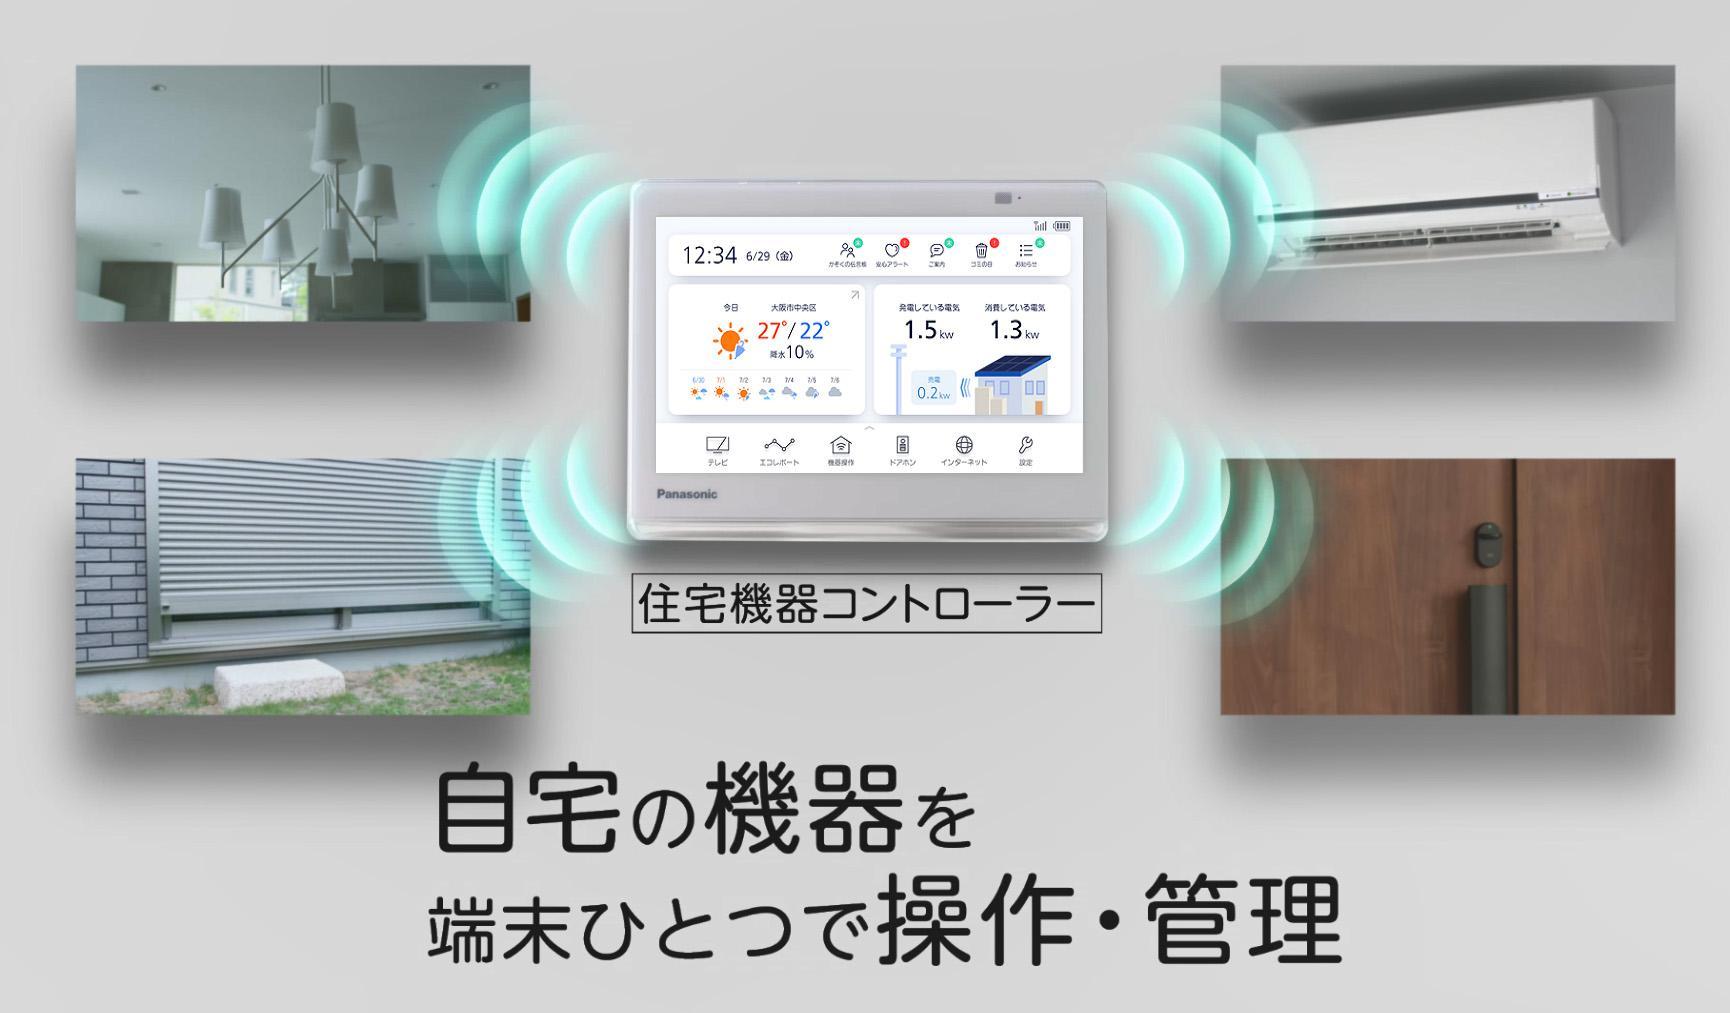 LINEやスマートスピーカーなどとの連携や危機管理情報の通知を行う住宅機器コントローラーを開発